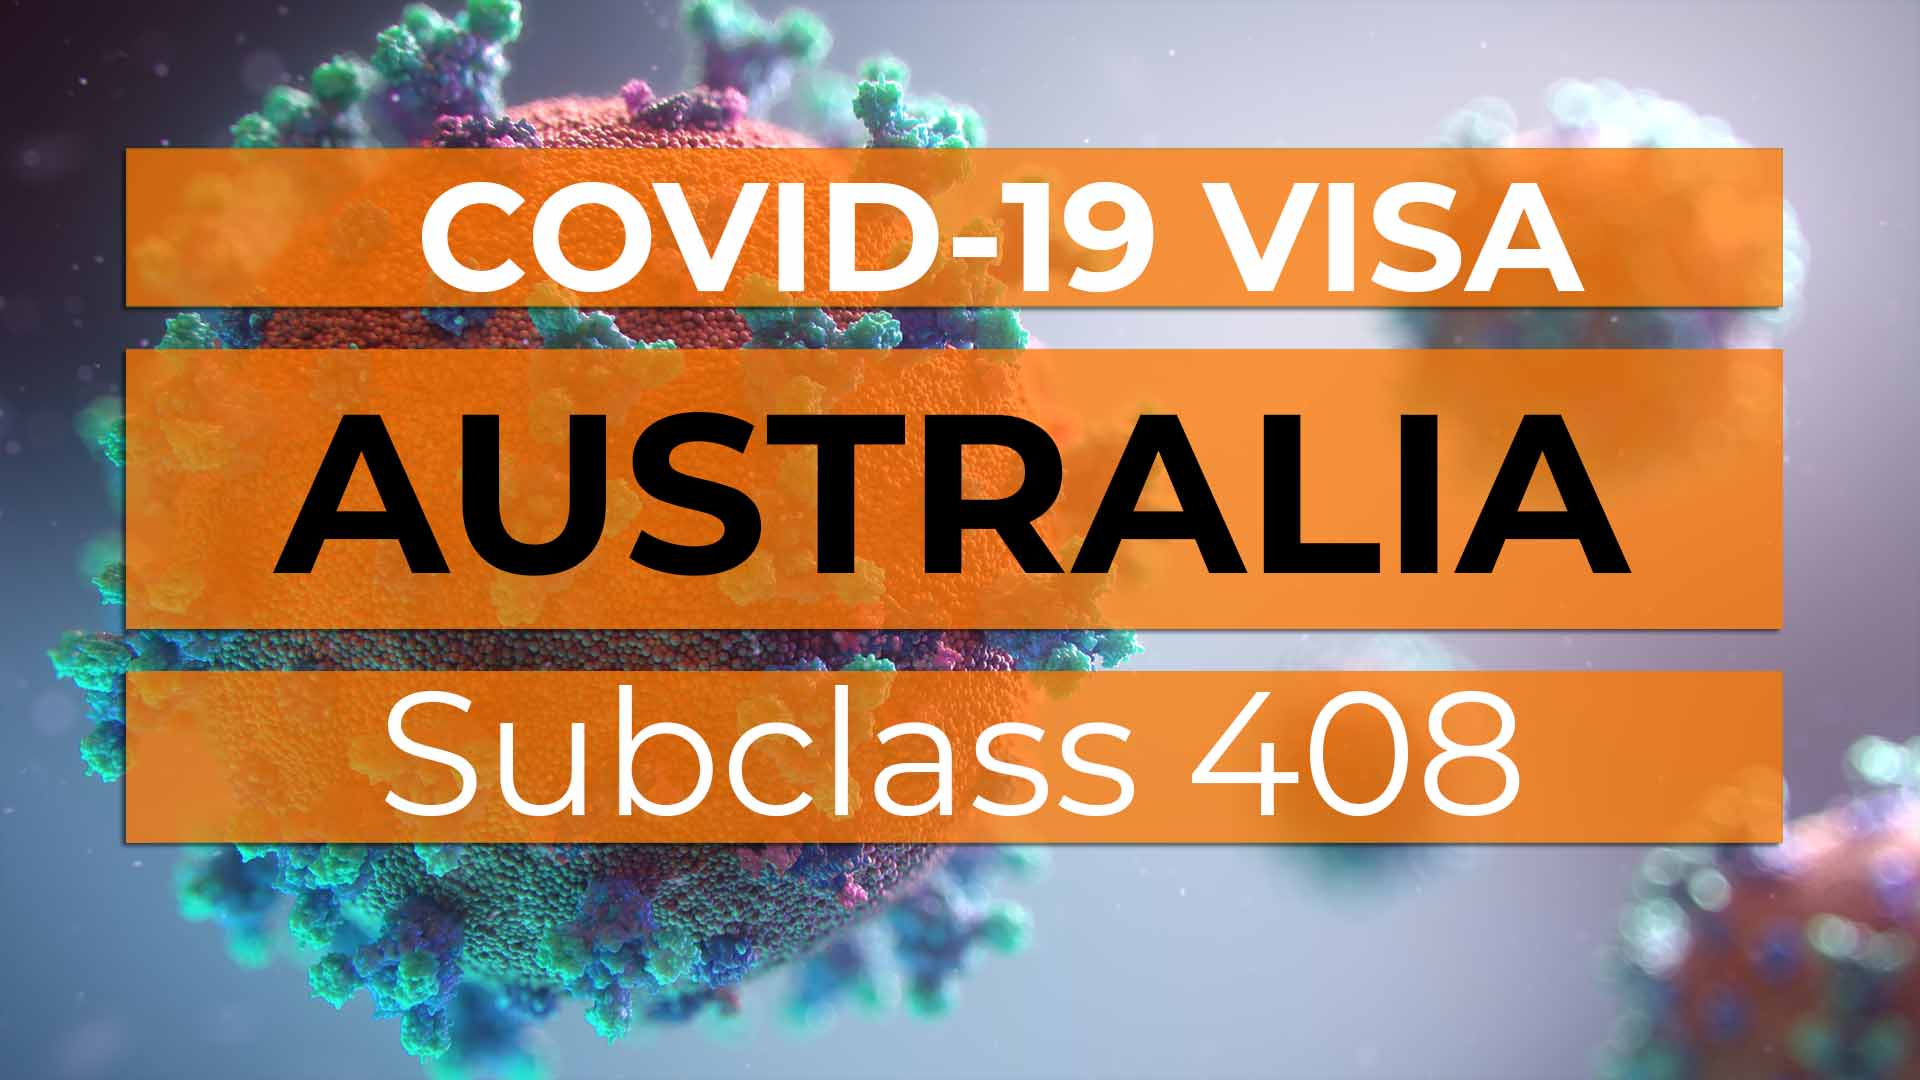 Australia COVID-19 Visa Subclass 408 - Cover